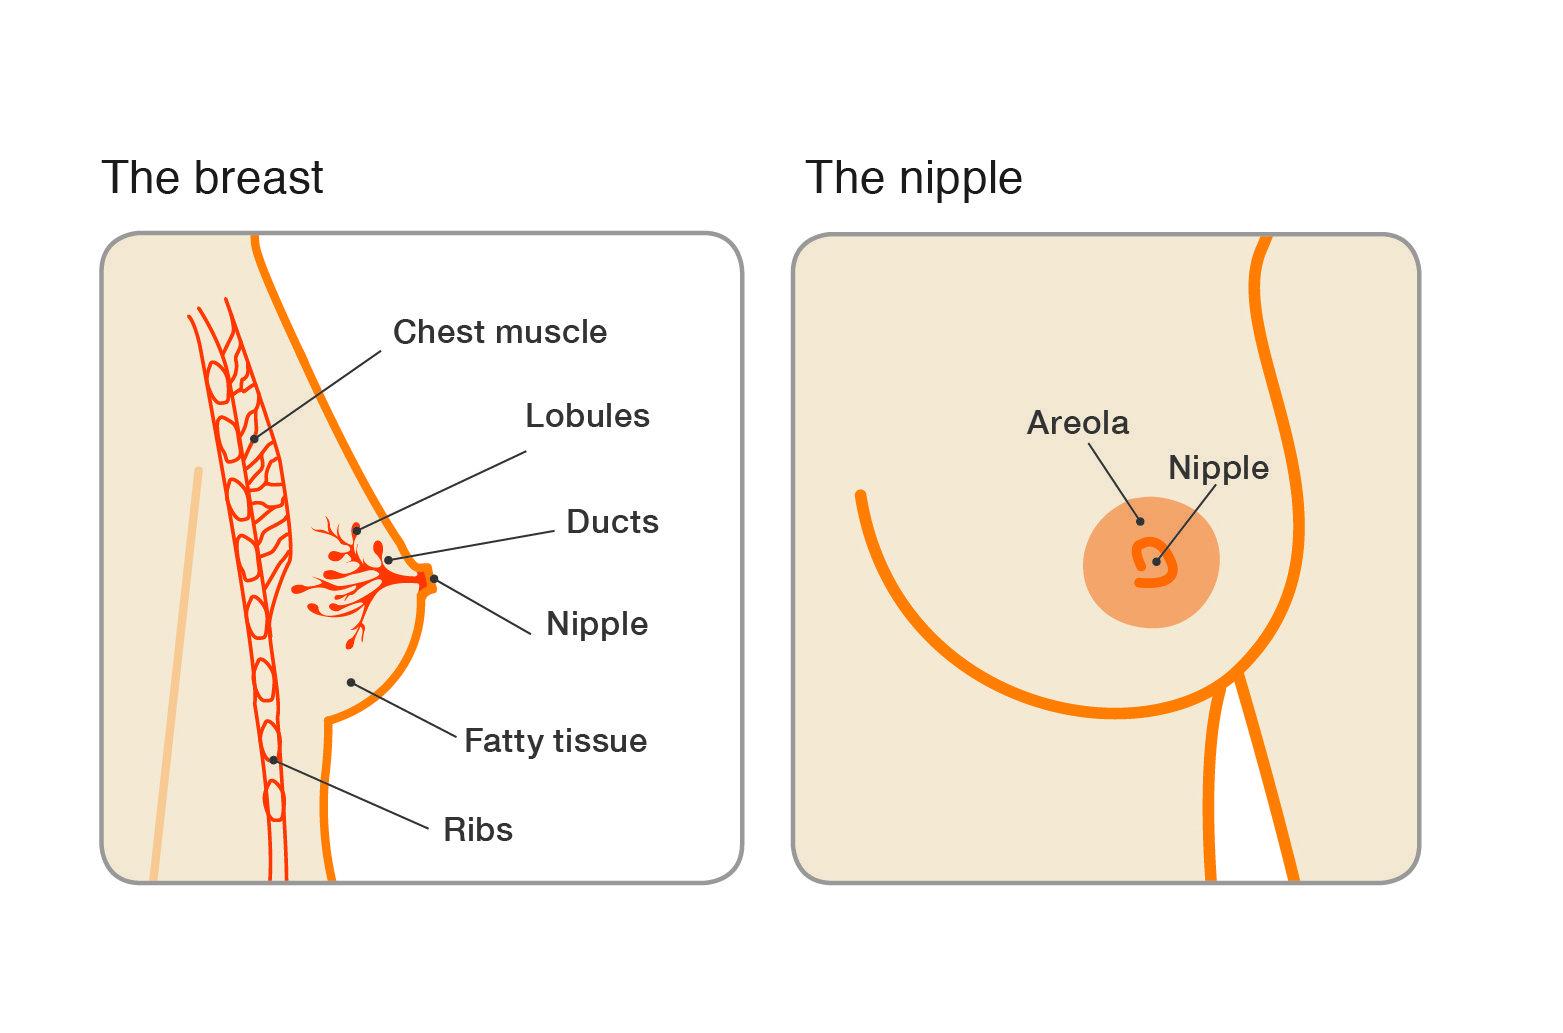 papiloma humano herpes tipo 1 cancer malign de colon